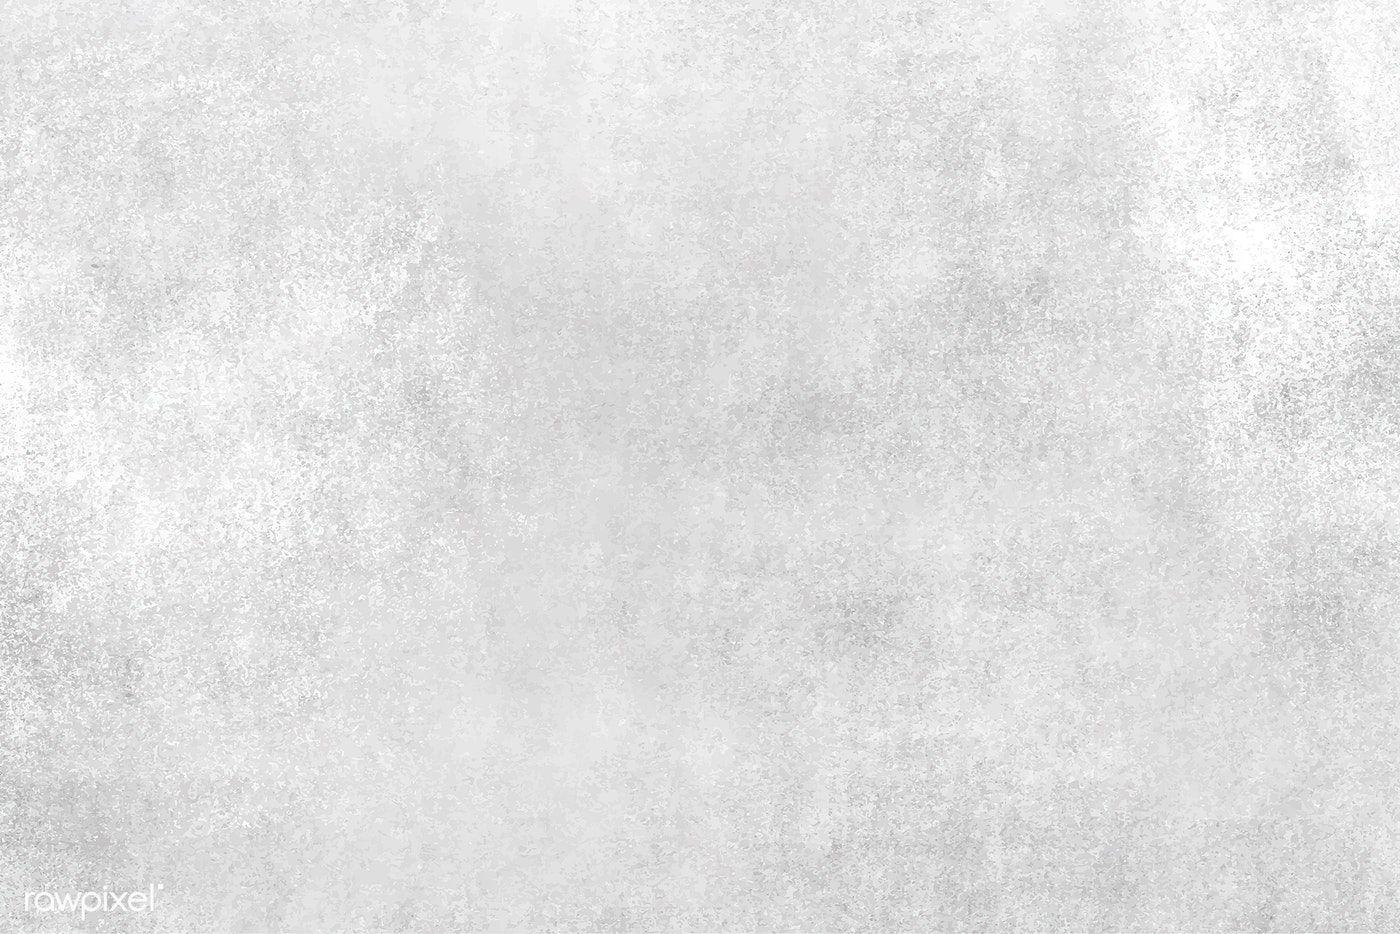 Grunge gray concrete textured background vector free